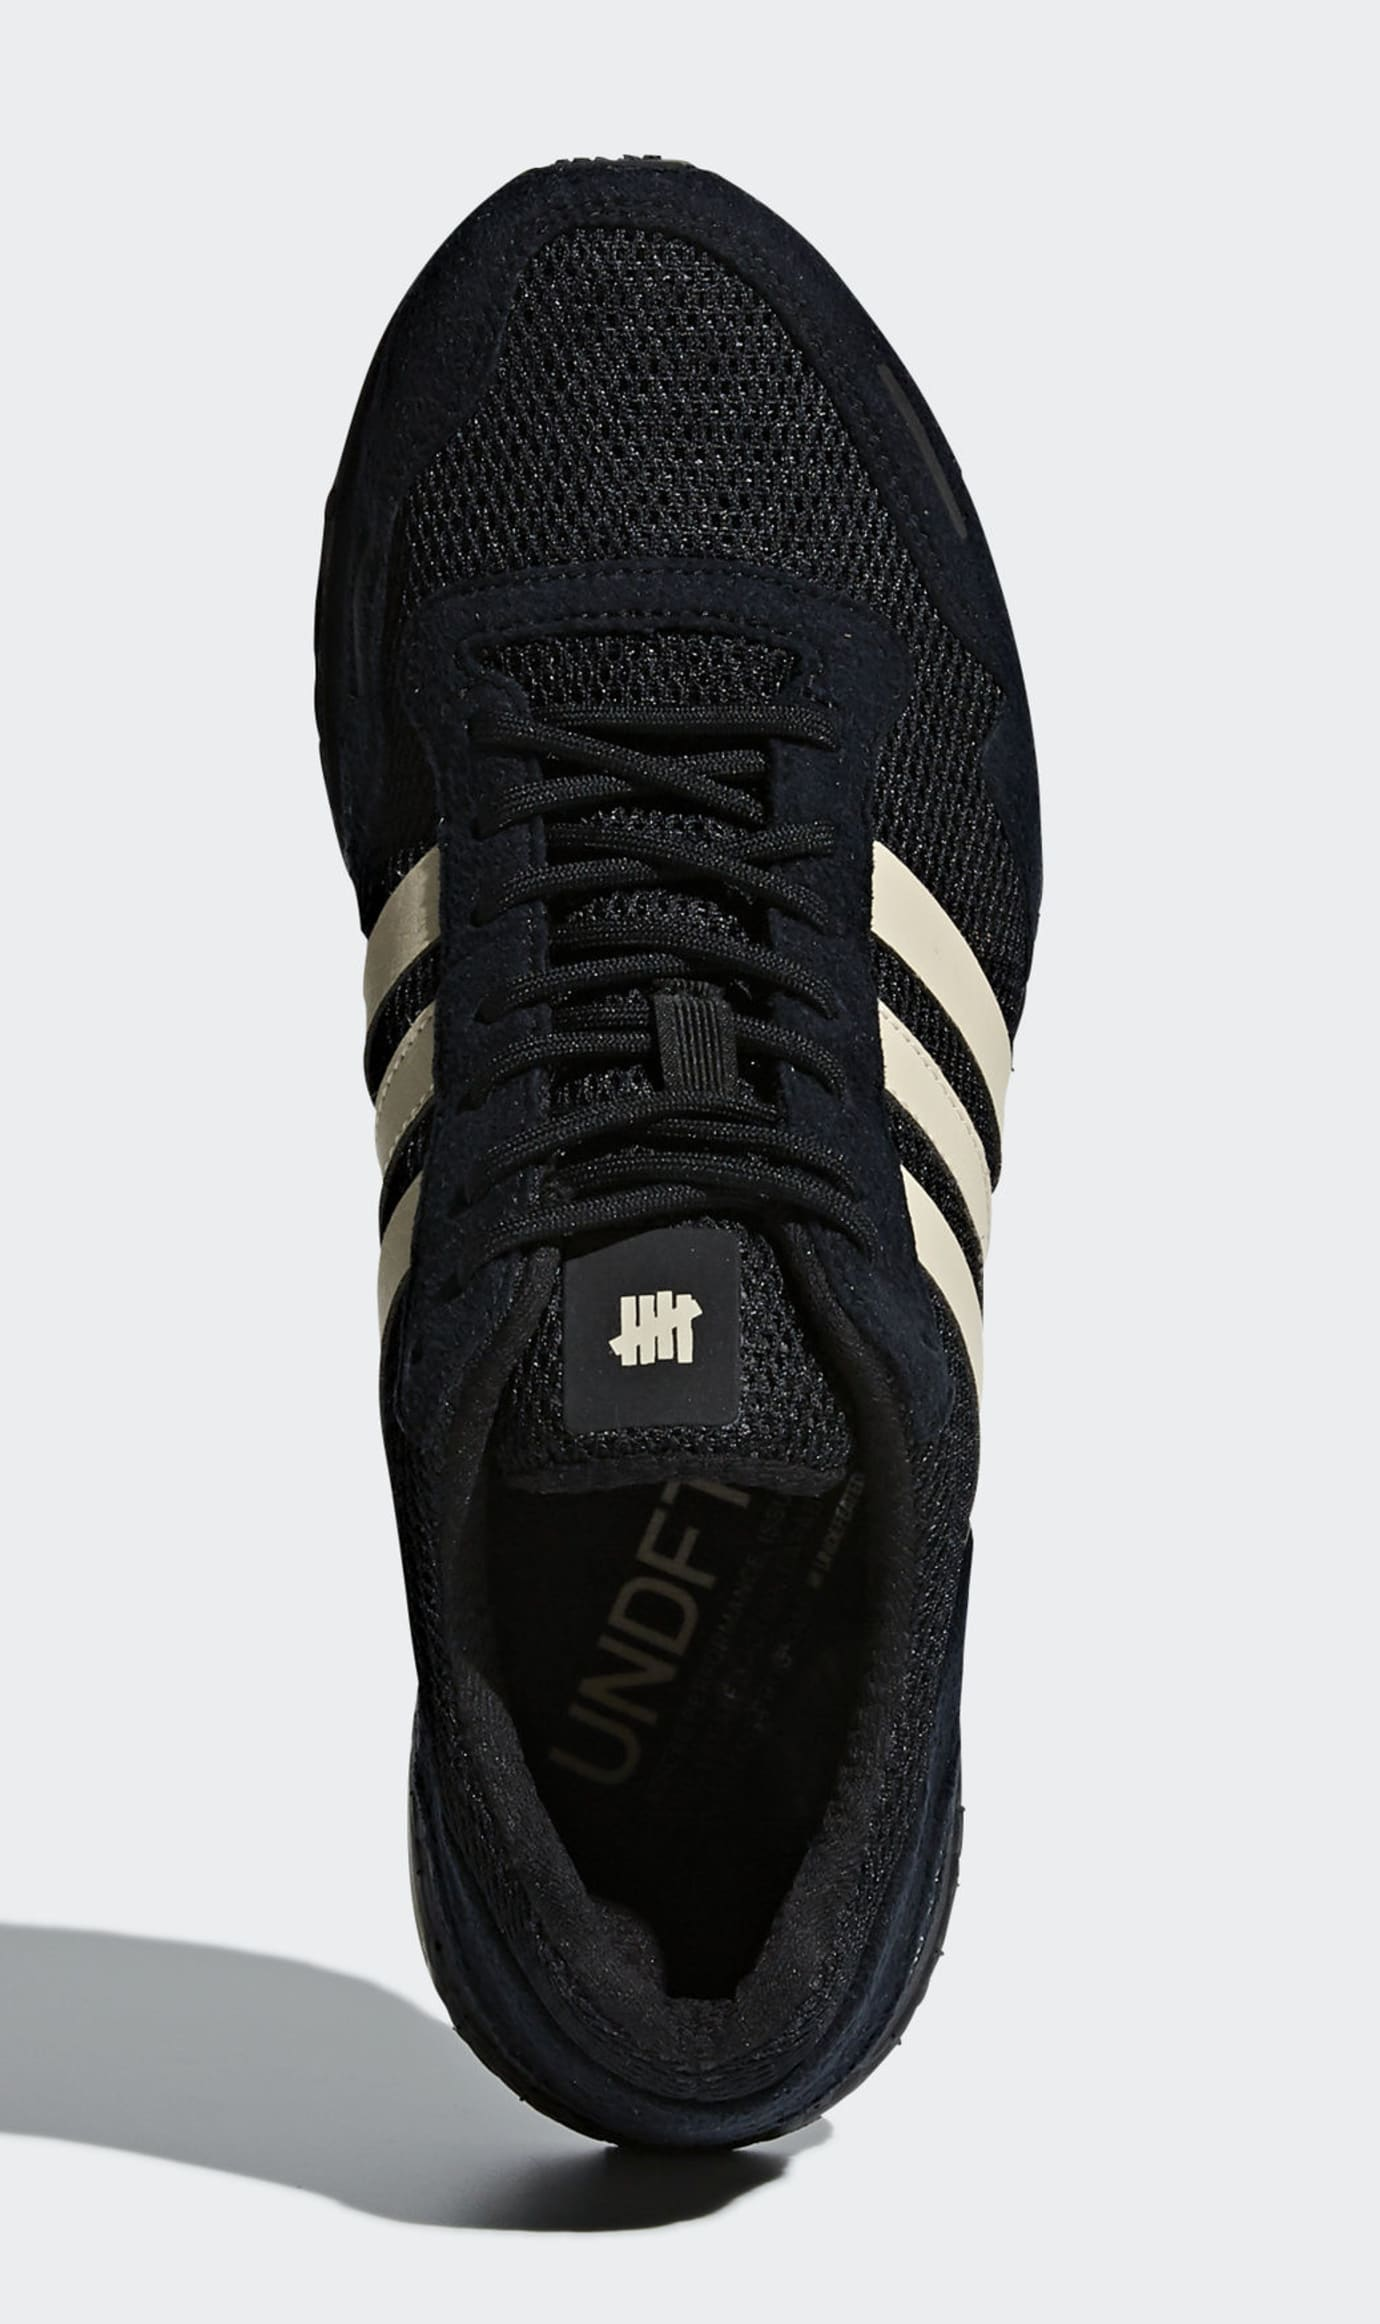 Undefeated x Adidas Adizero Adios 3 B22483 (Top)